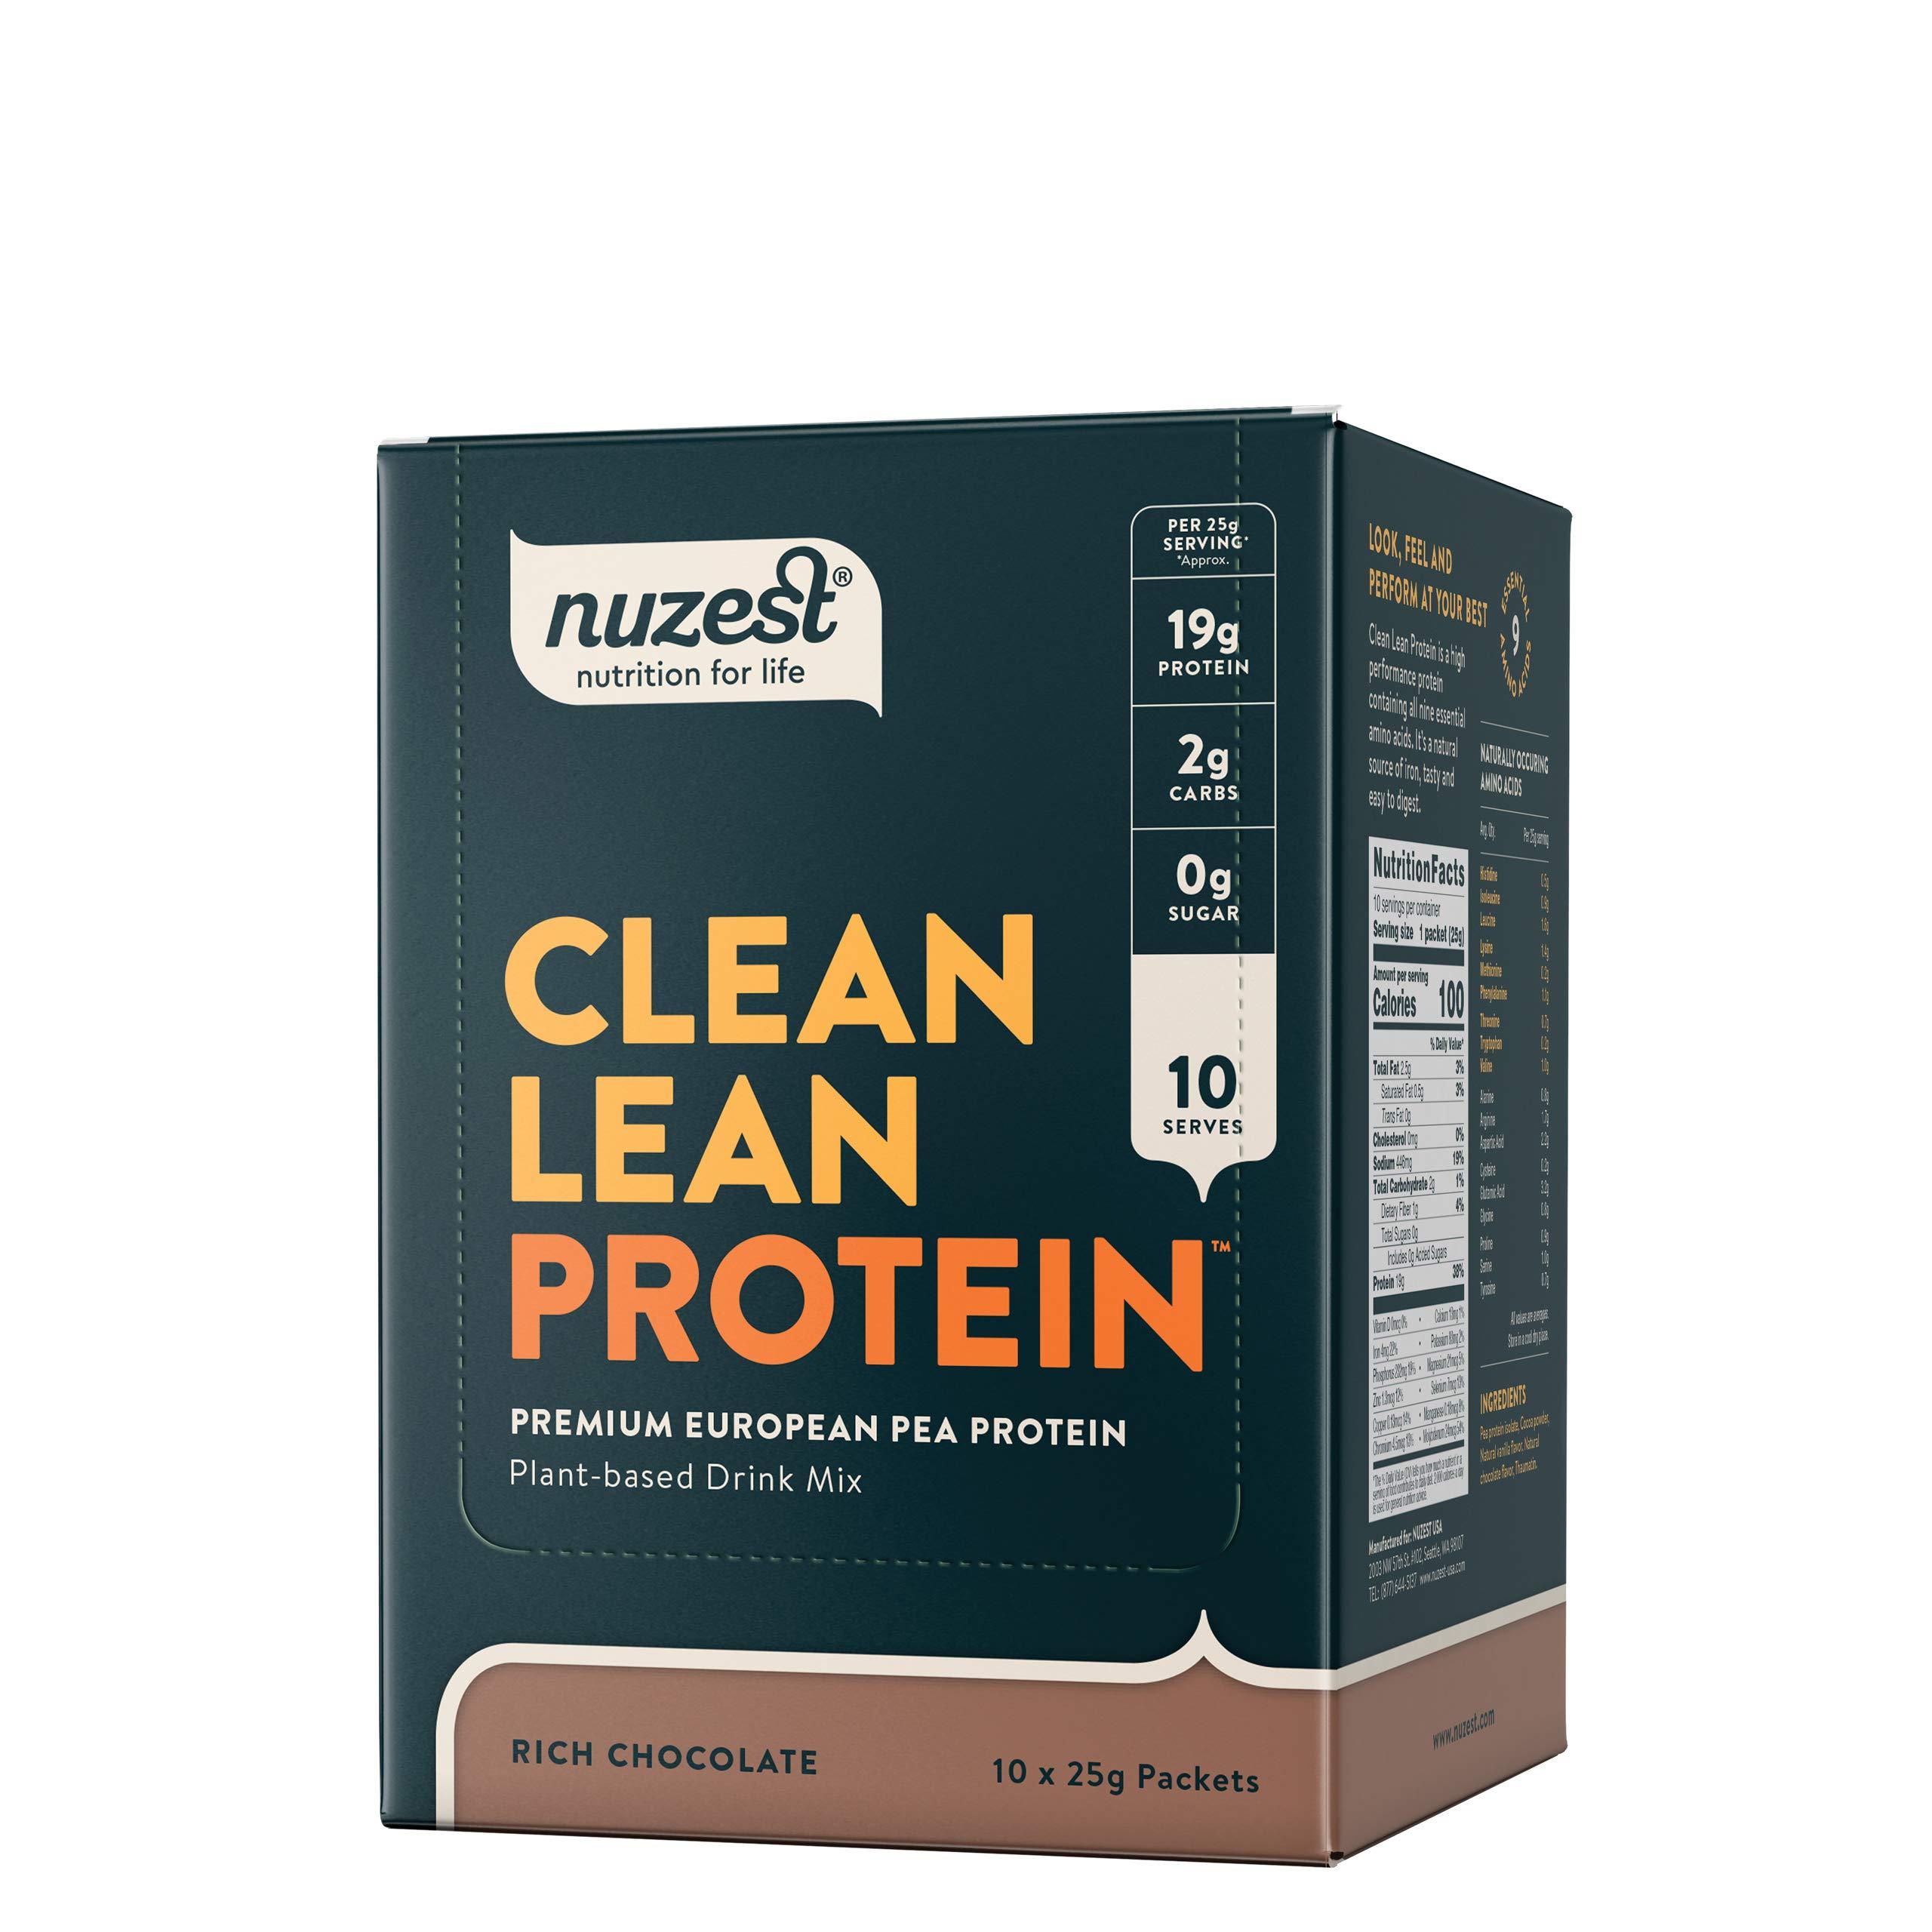 Nuzest Clean Lean Protein - Premium Vegan Protein Powder, Plant Protein Powder, European Golden Pea Protein, Dairy Free, Gluten Free, GMO Free, Naturally Sweetened, Rich Chocolate, 10 Count